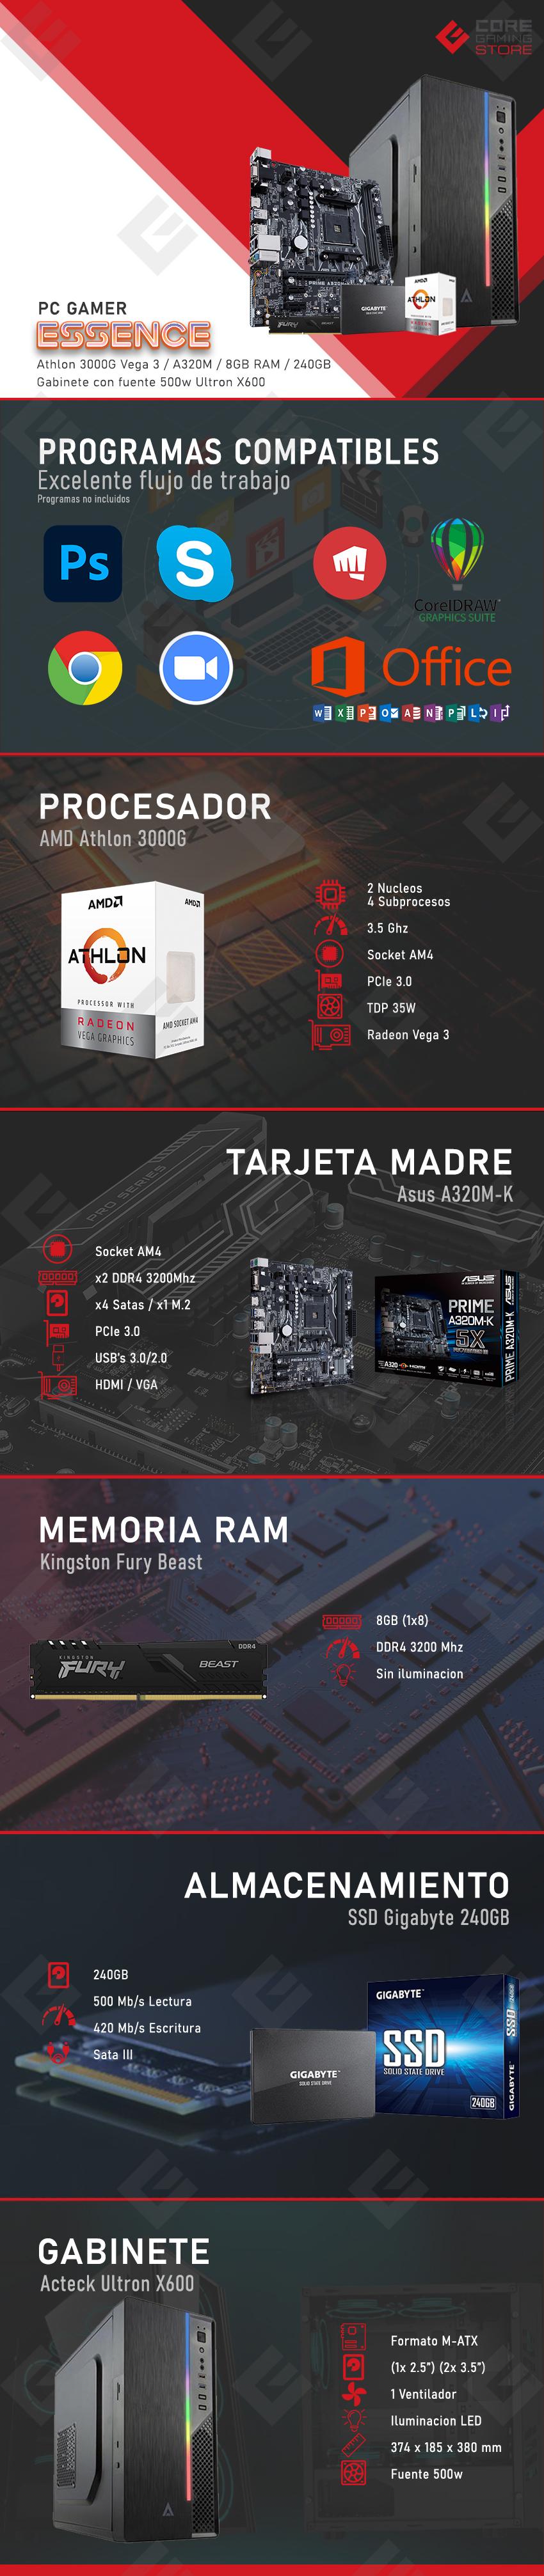 PC Gamer Essence AMD